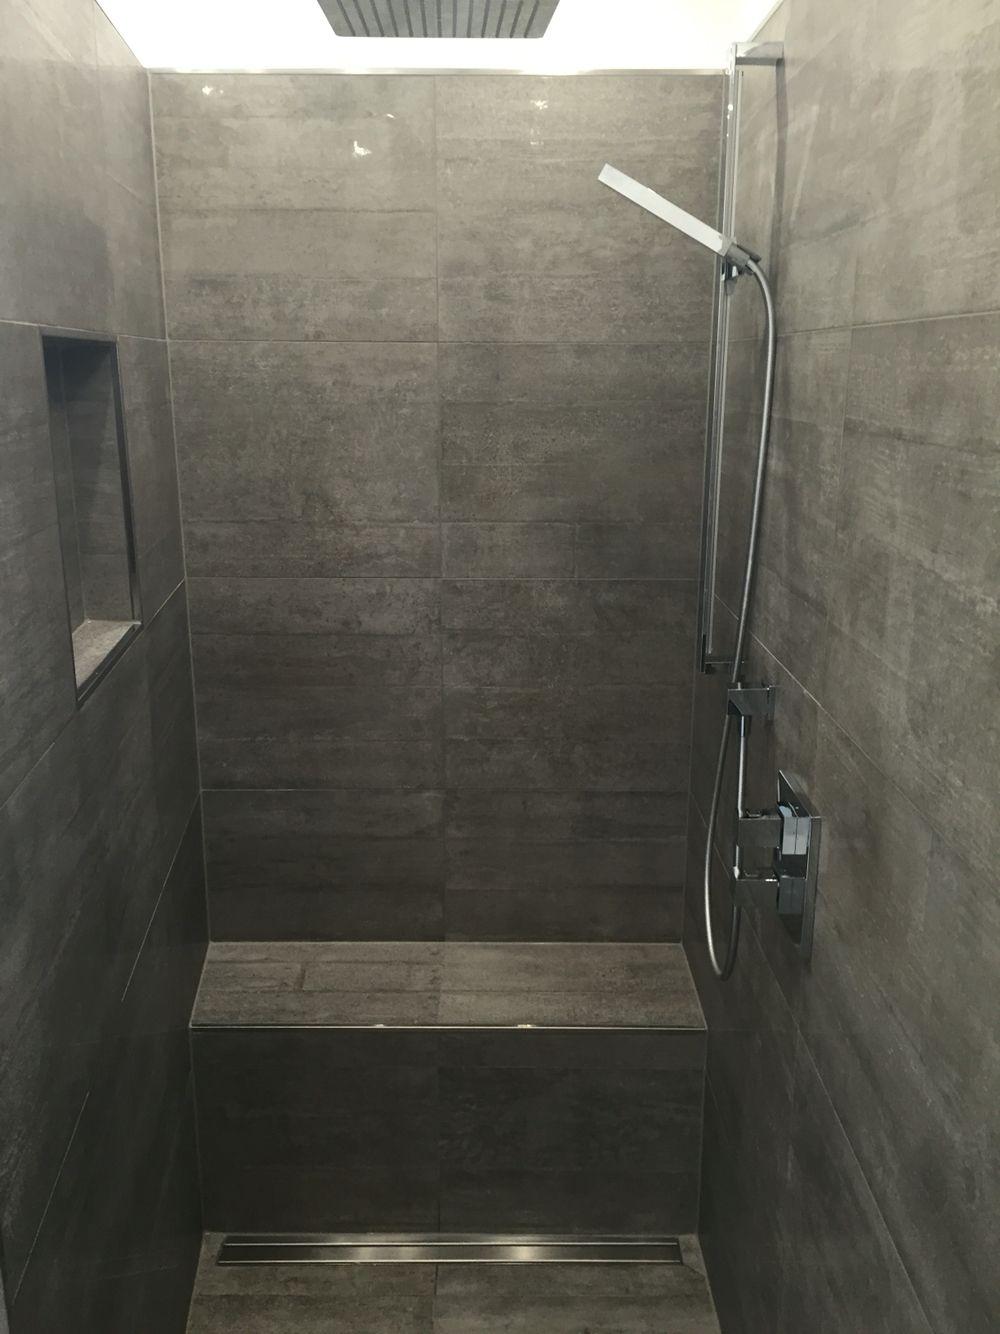 Badezimmer ideen halb geflieste wände justus conrad justusconrad on pinterest